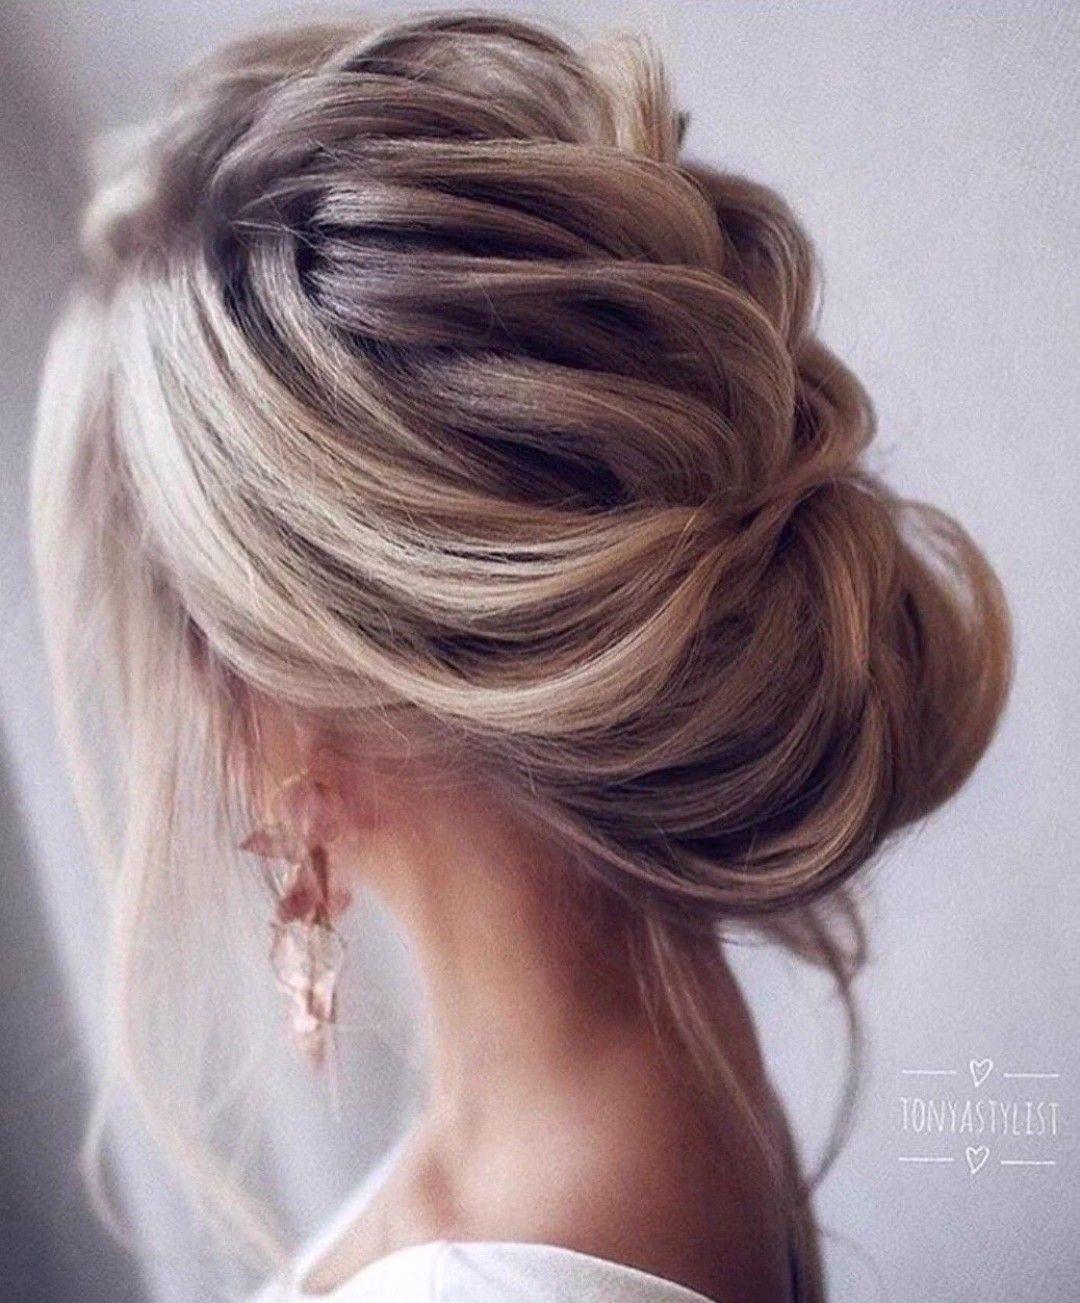 Pin by R.H on Fryzury in 10  Medium length hair styles, Medium